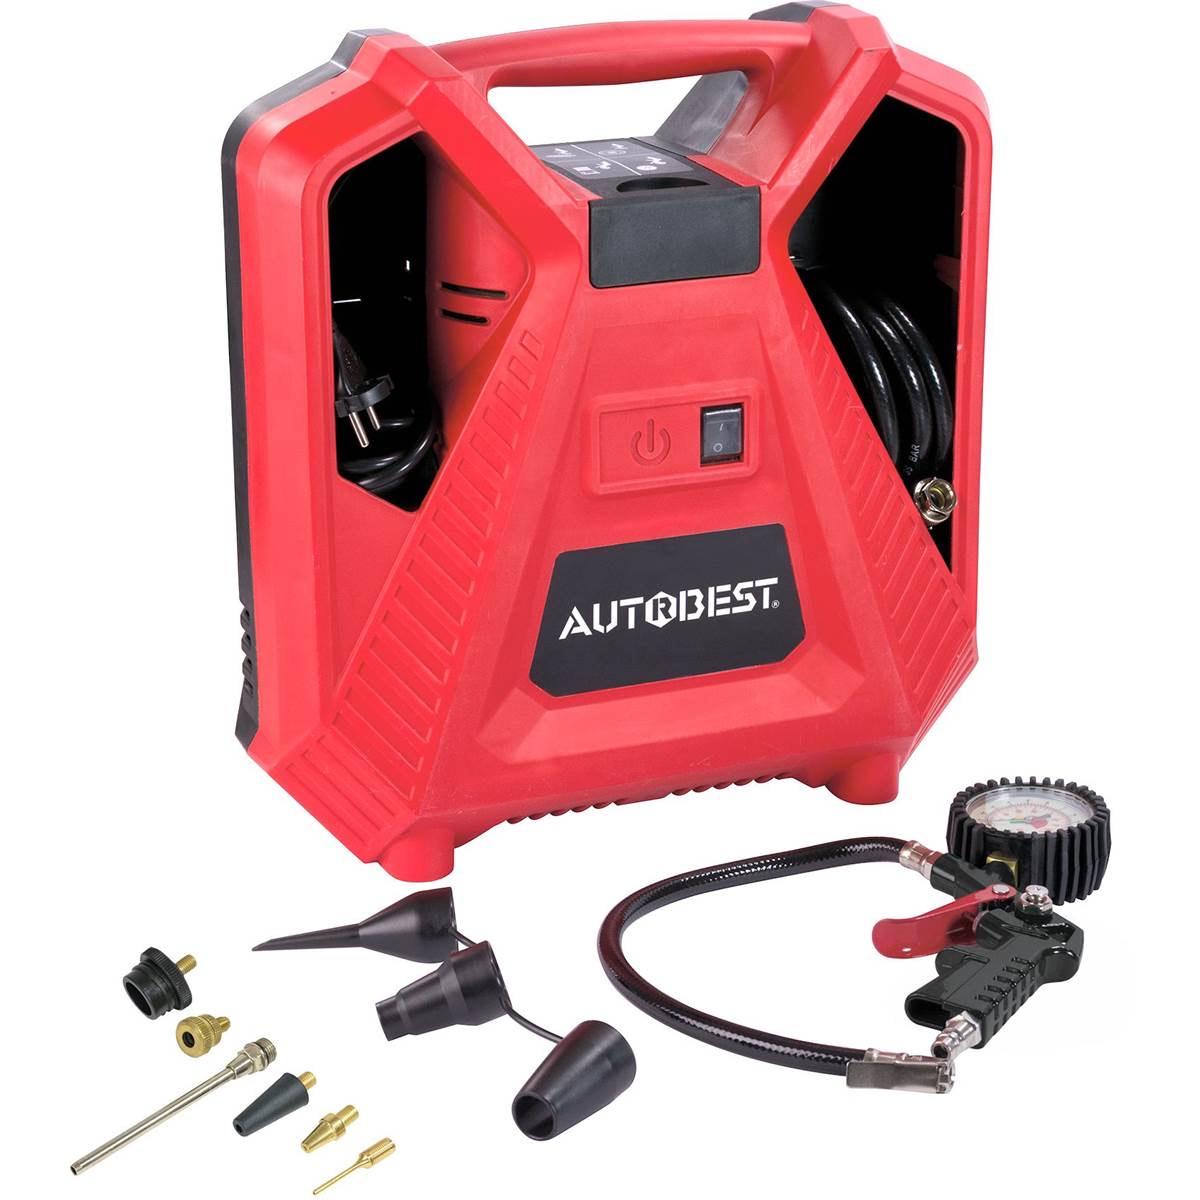 Compresseur d'air Autobest - 230V